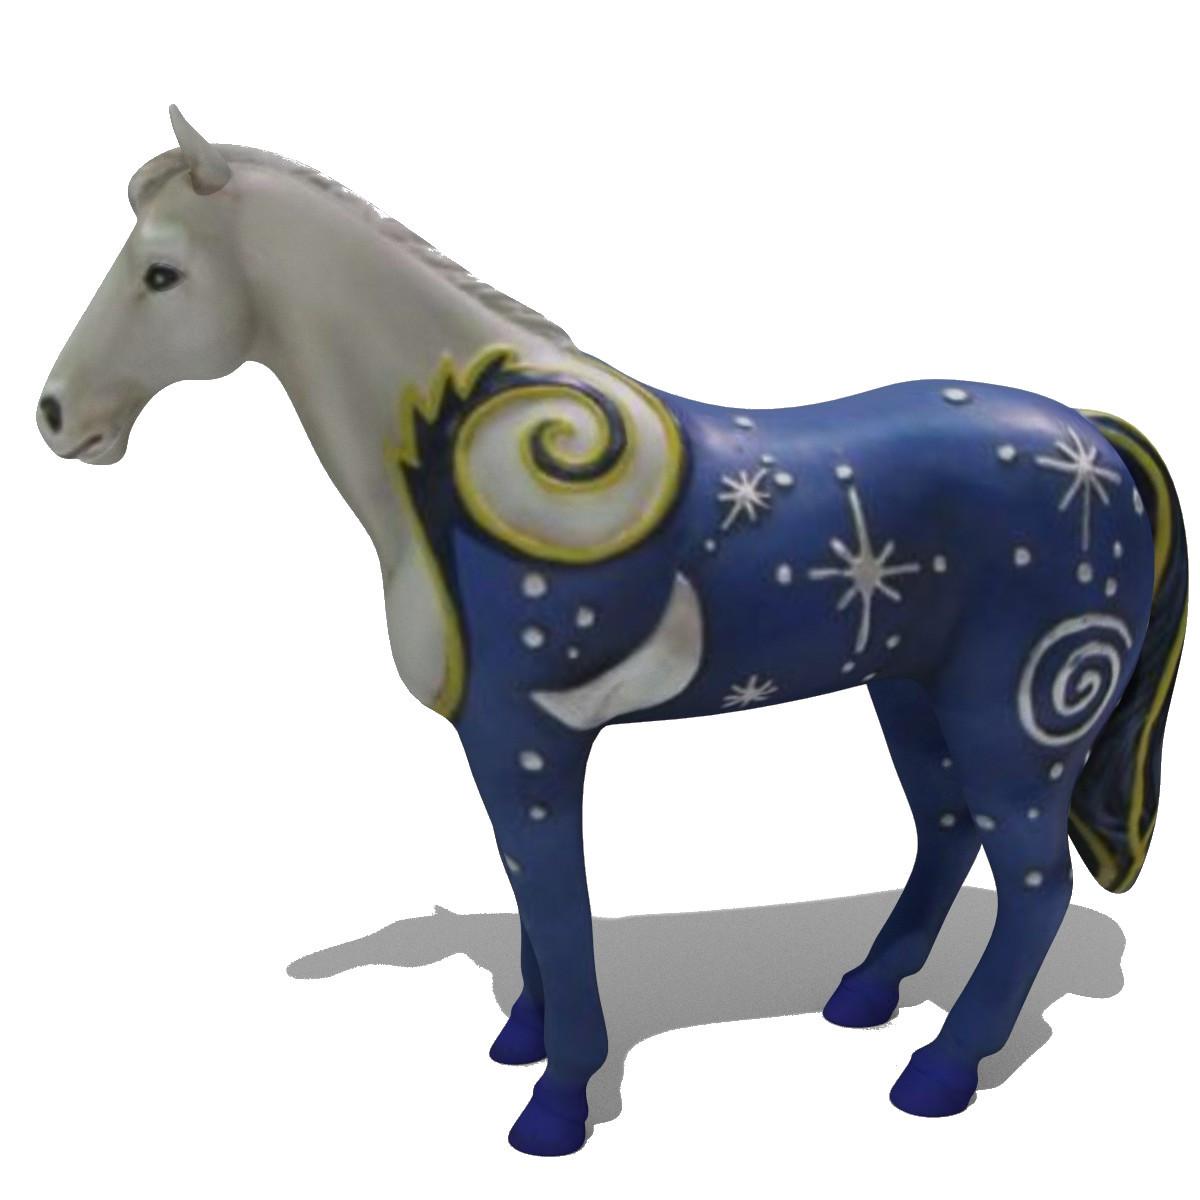 Horse_Z3_01.jpg